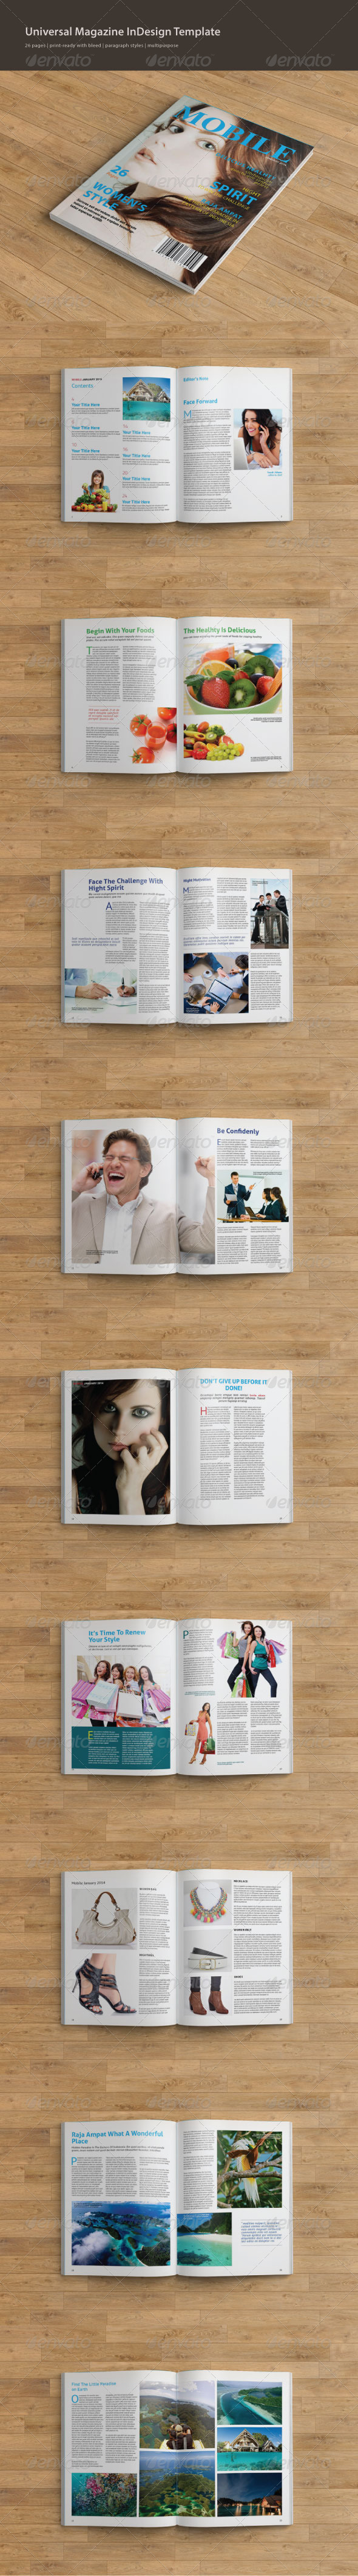 GraphicRiver Universal Magazine InDesign Template 7181237